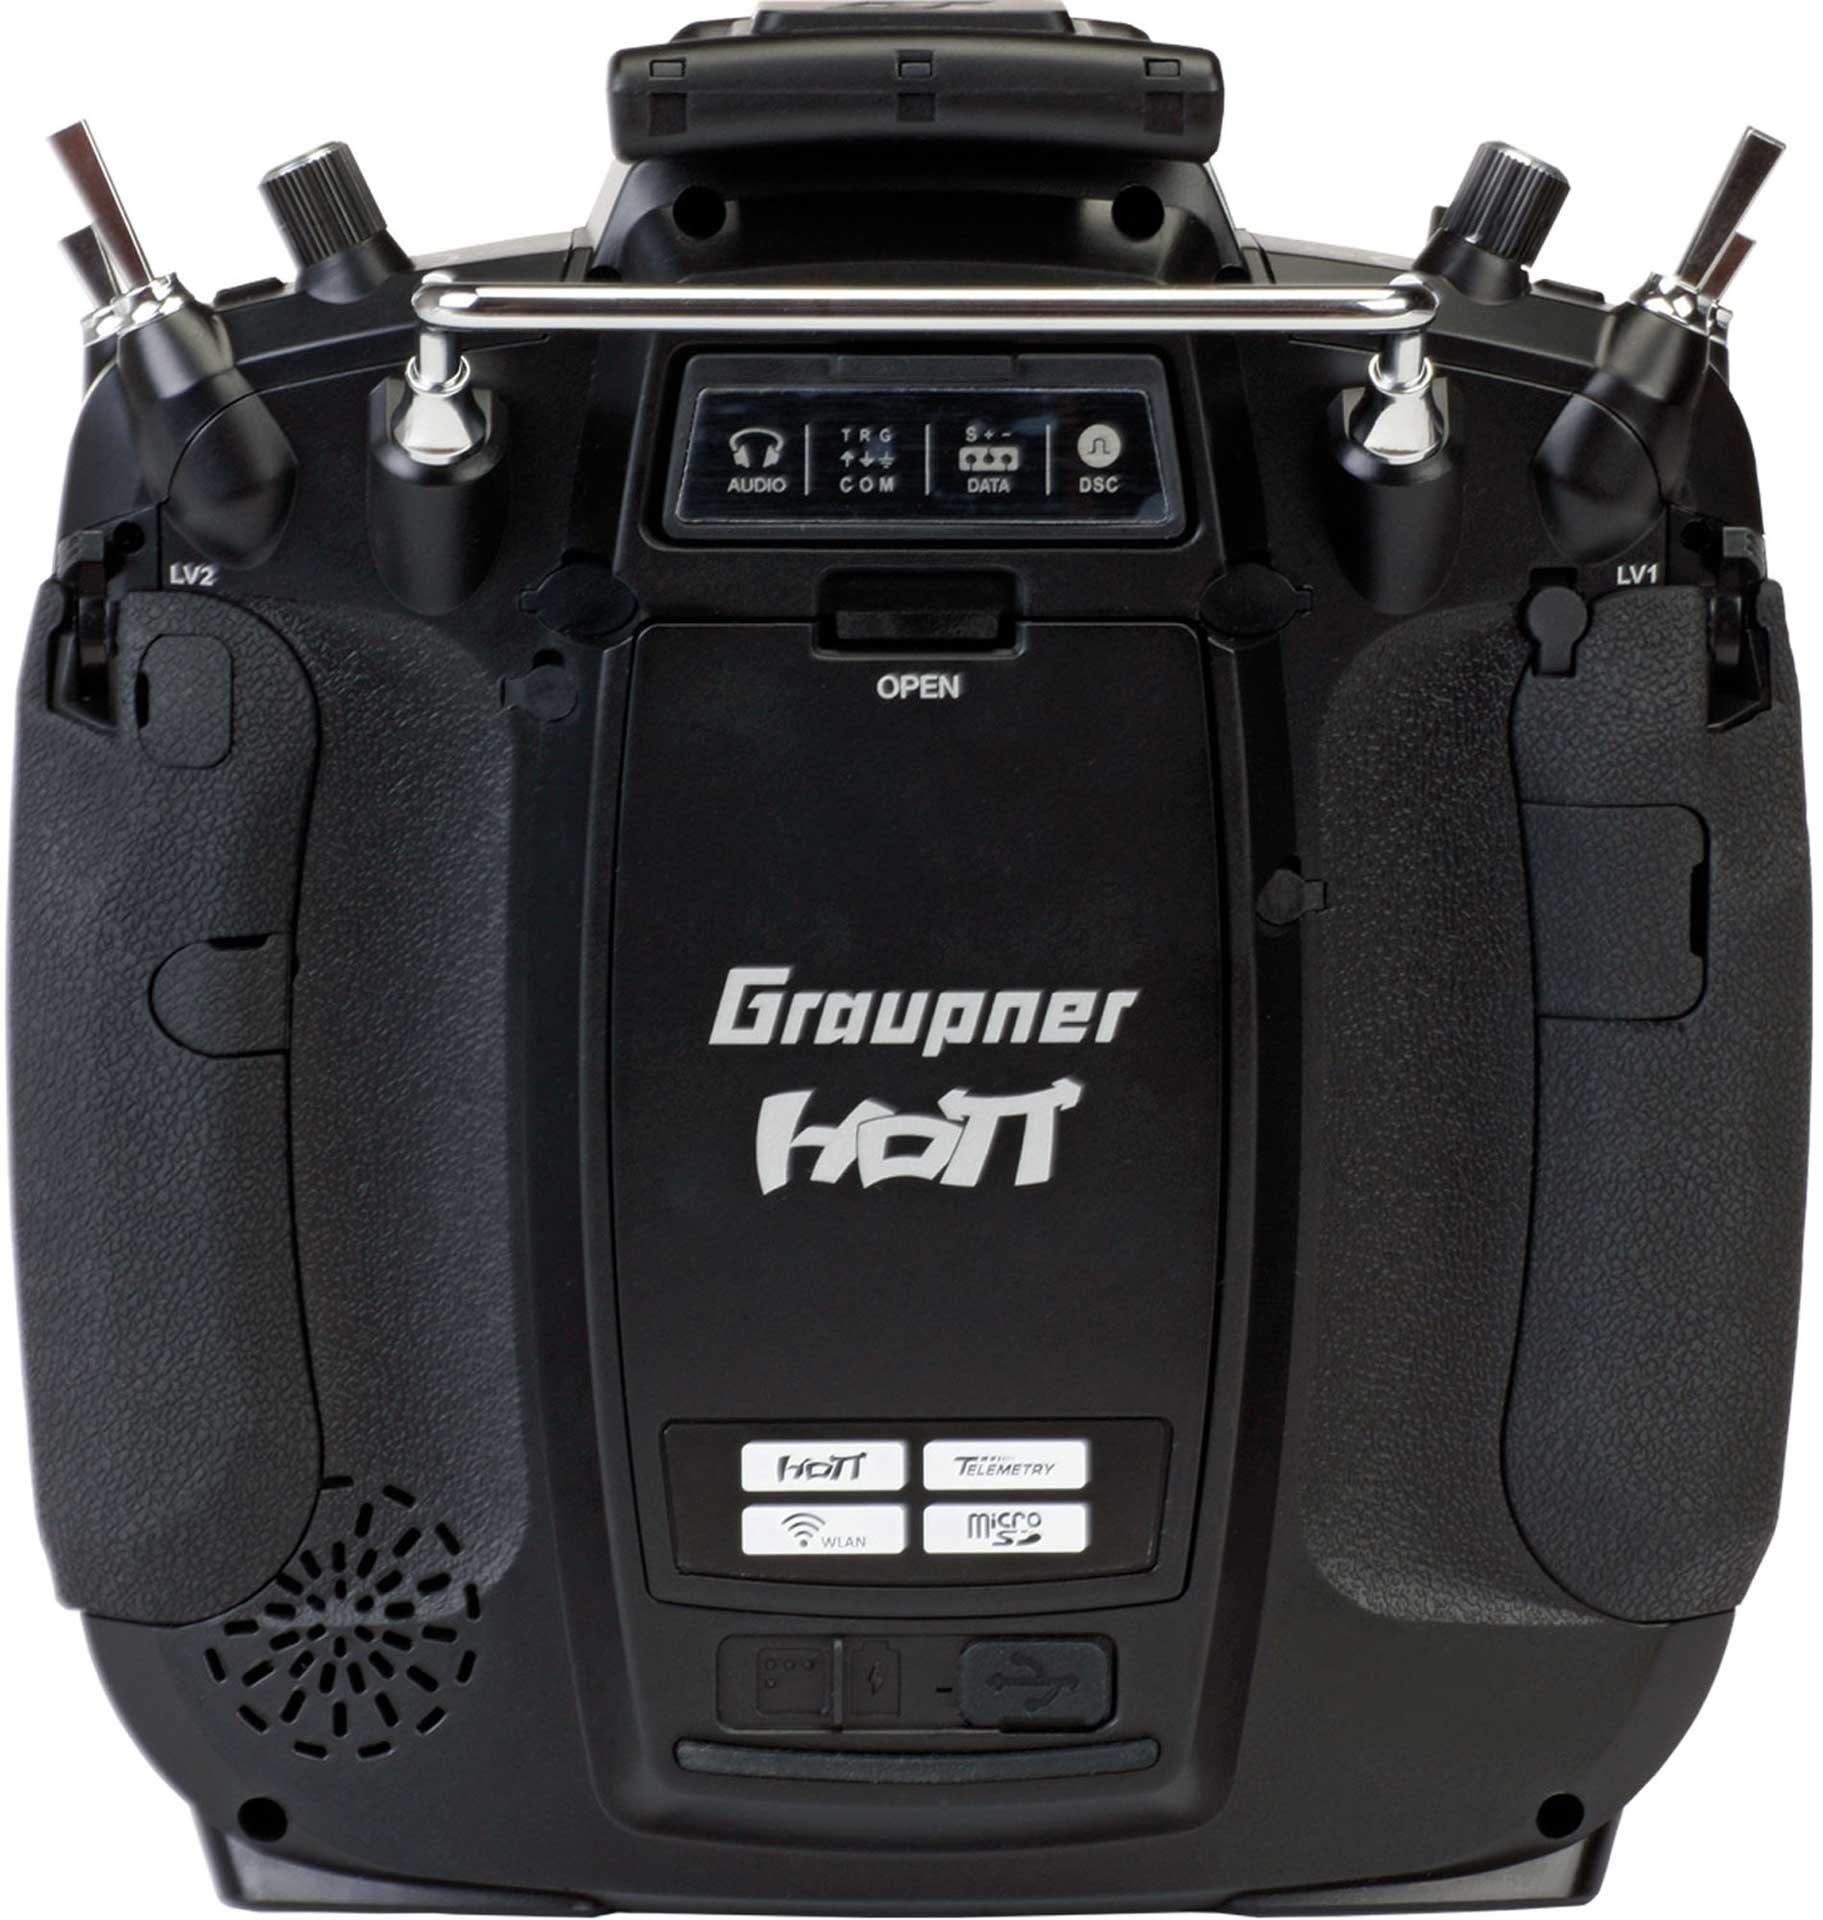 GRAUPNER MZ-16 HOTT 16-KANAL Einzelsender 2,4Ghz Fernsteuerung